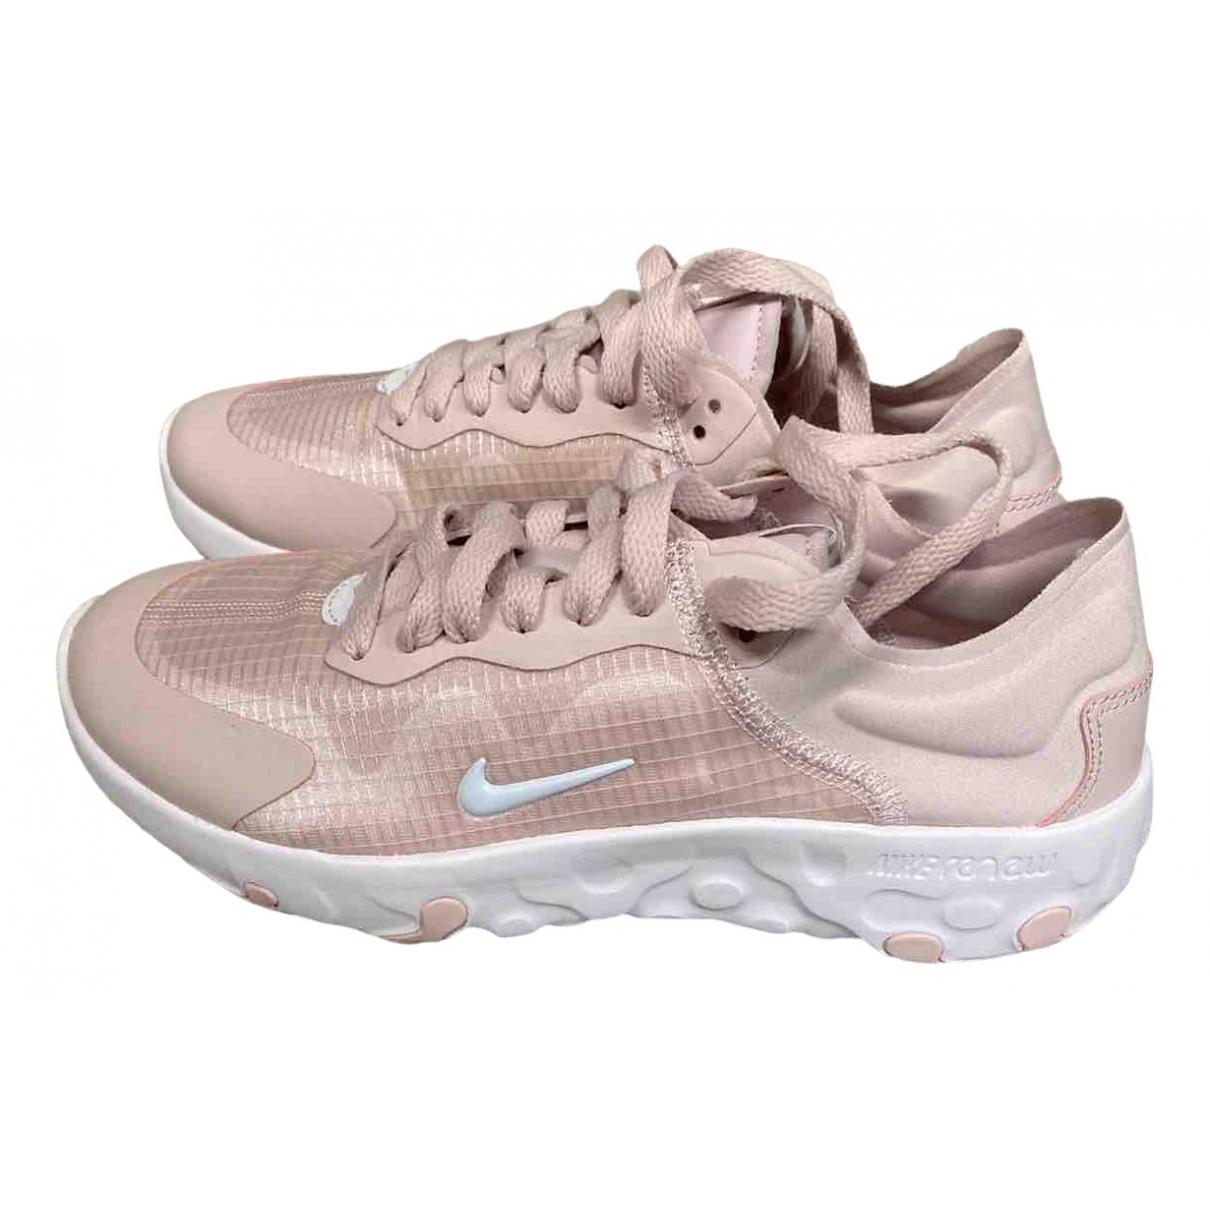 Nike - Baskets   pour femme en toile - rose